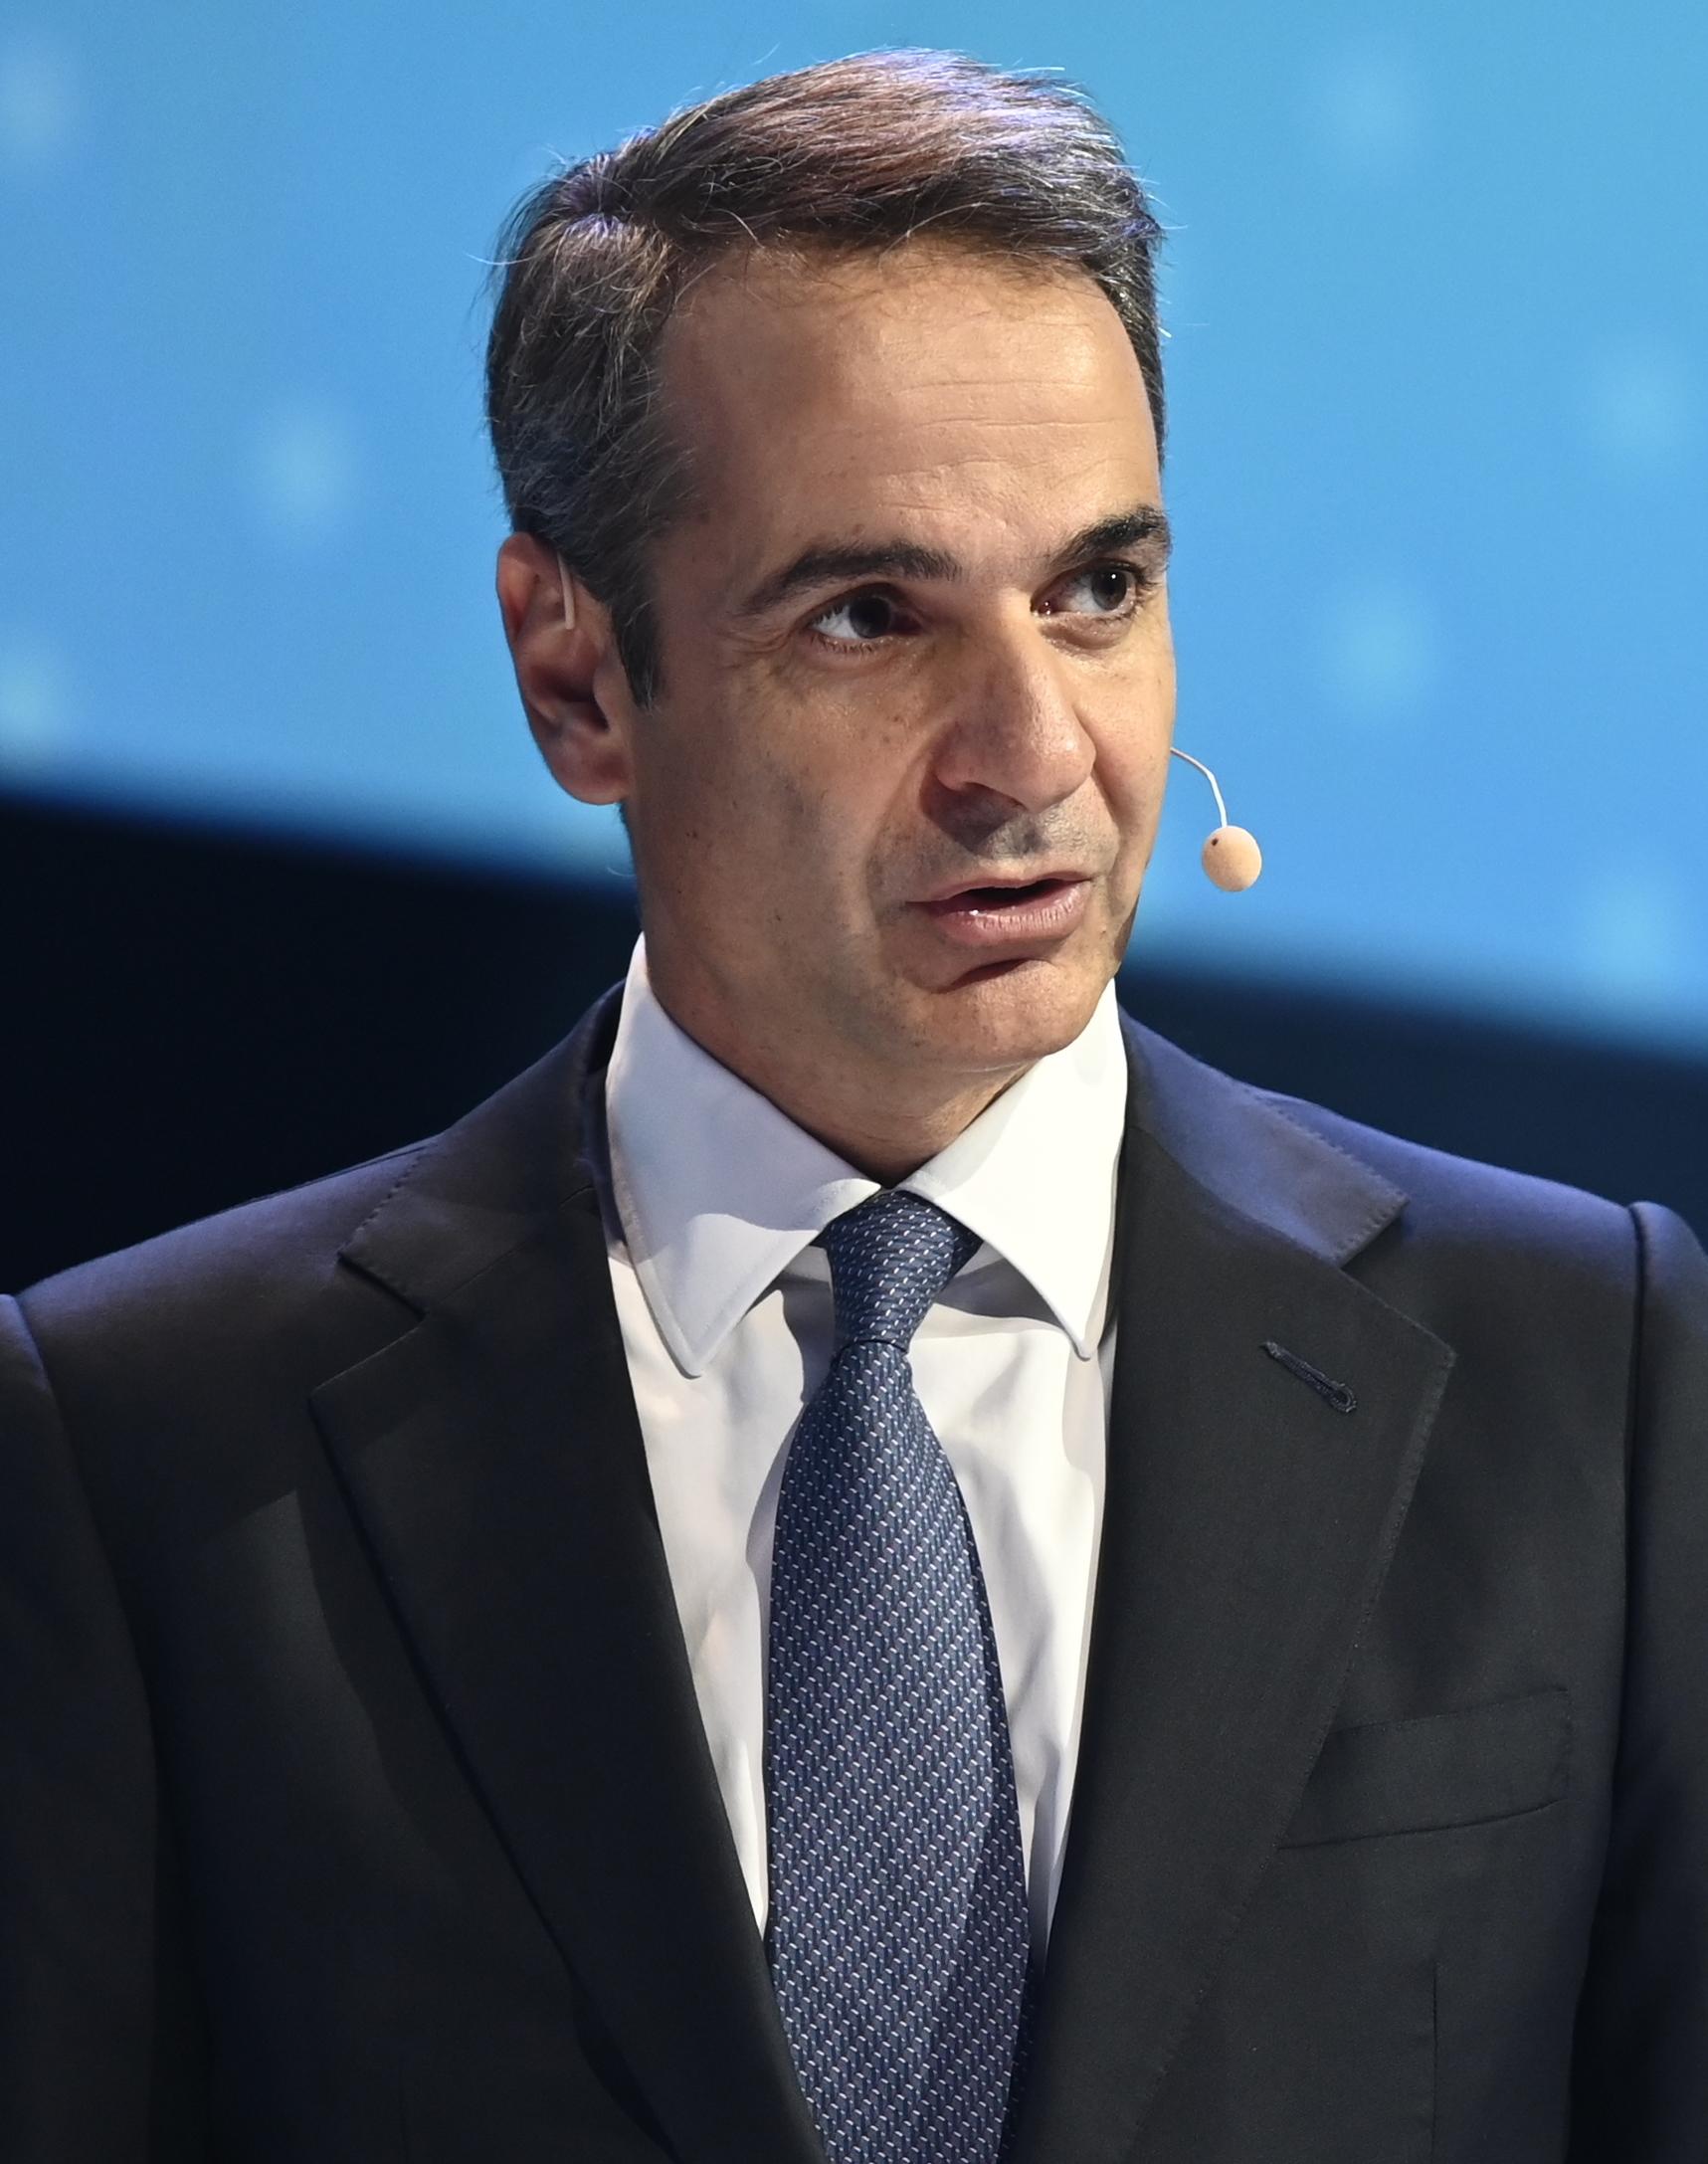 Prime Minister Of Greece Wikipedia